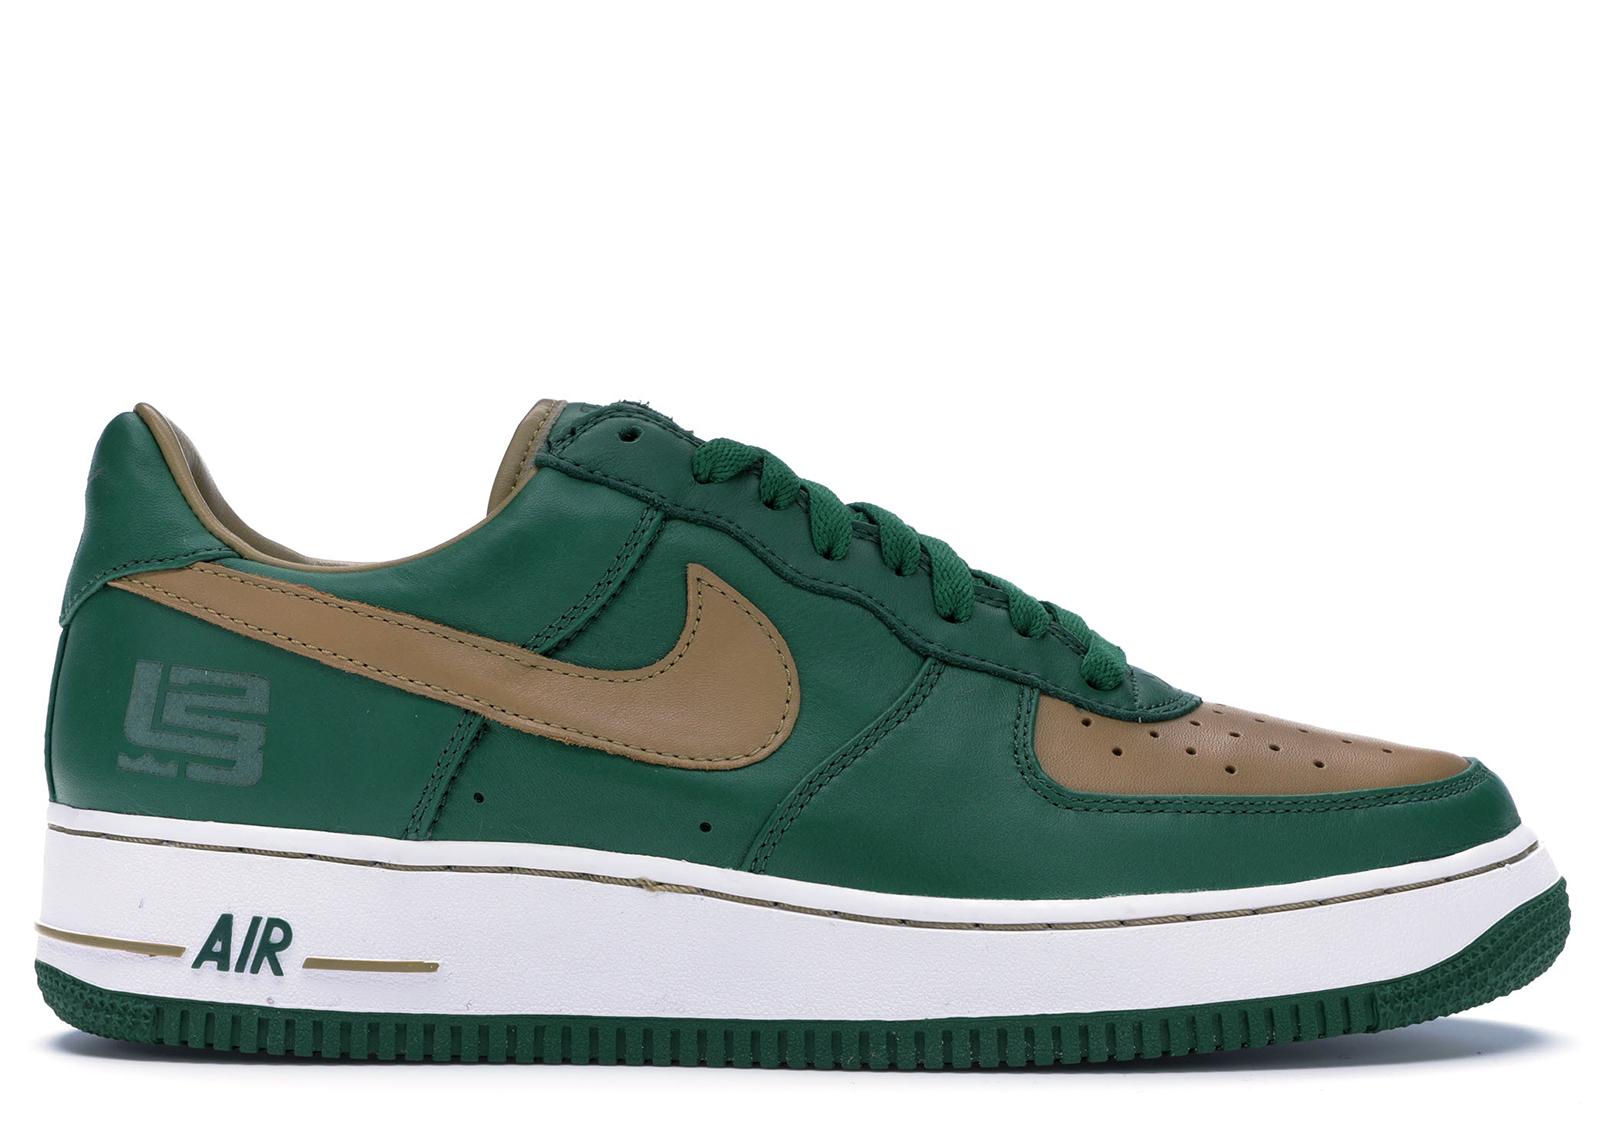 Nike Air Force 1 Low LeBron SVSM